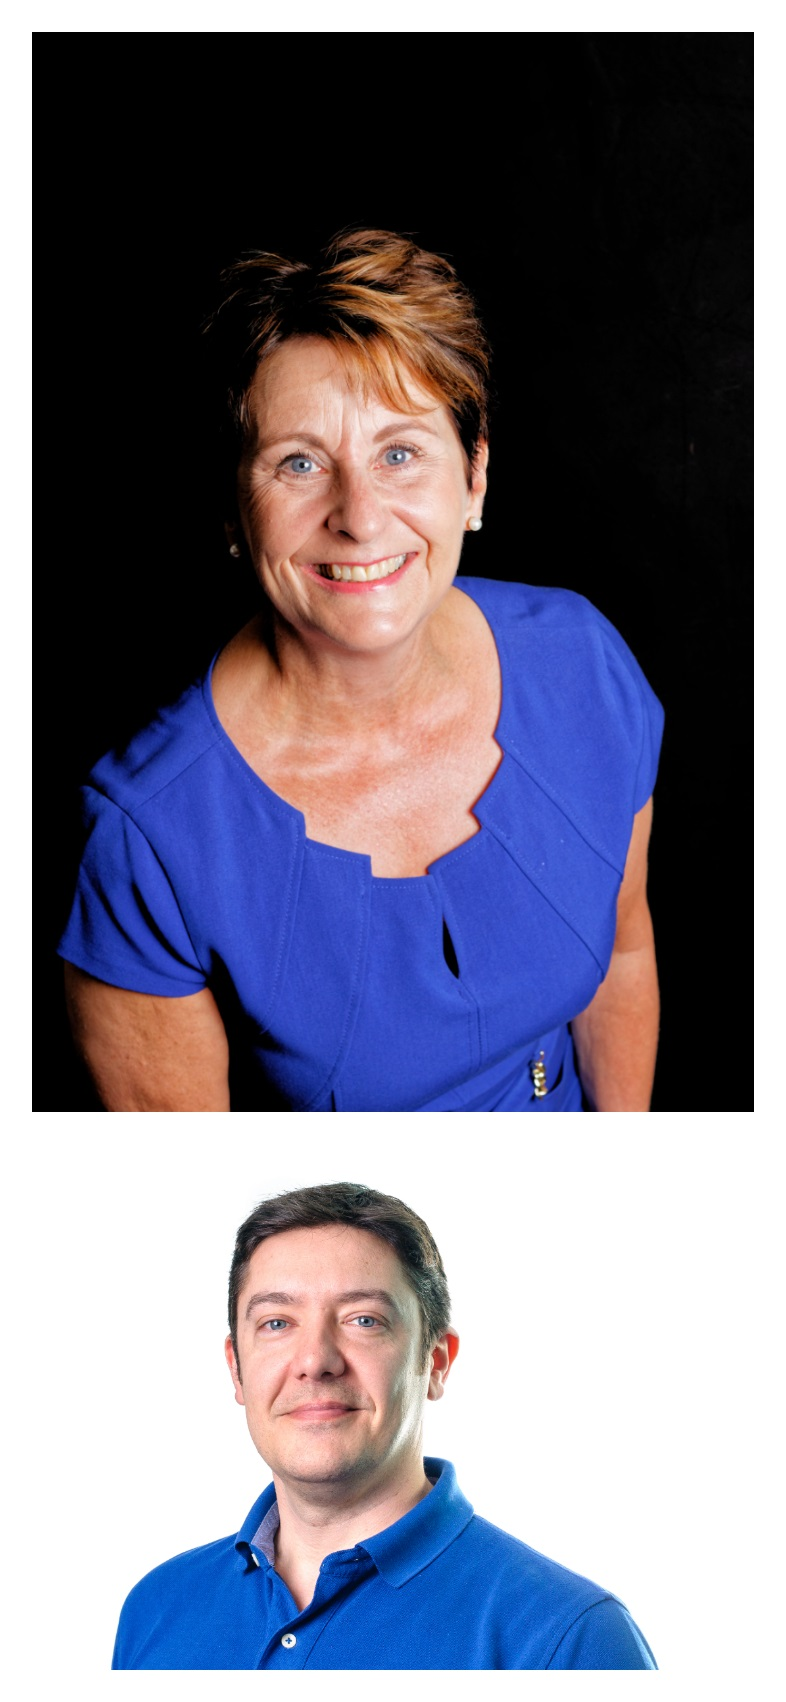 Business Head shots Portrait photography Birmingham Midlands Warwickshire UK by Chris Fossey 6